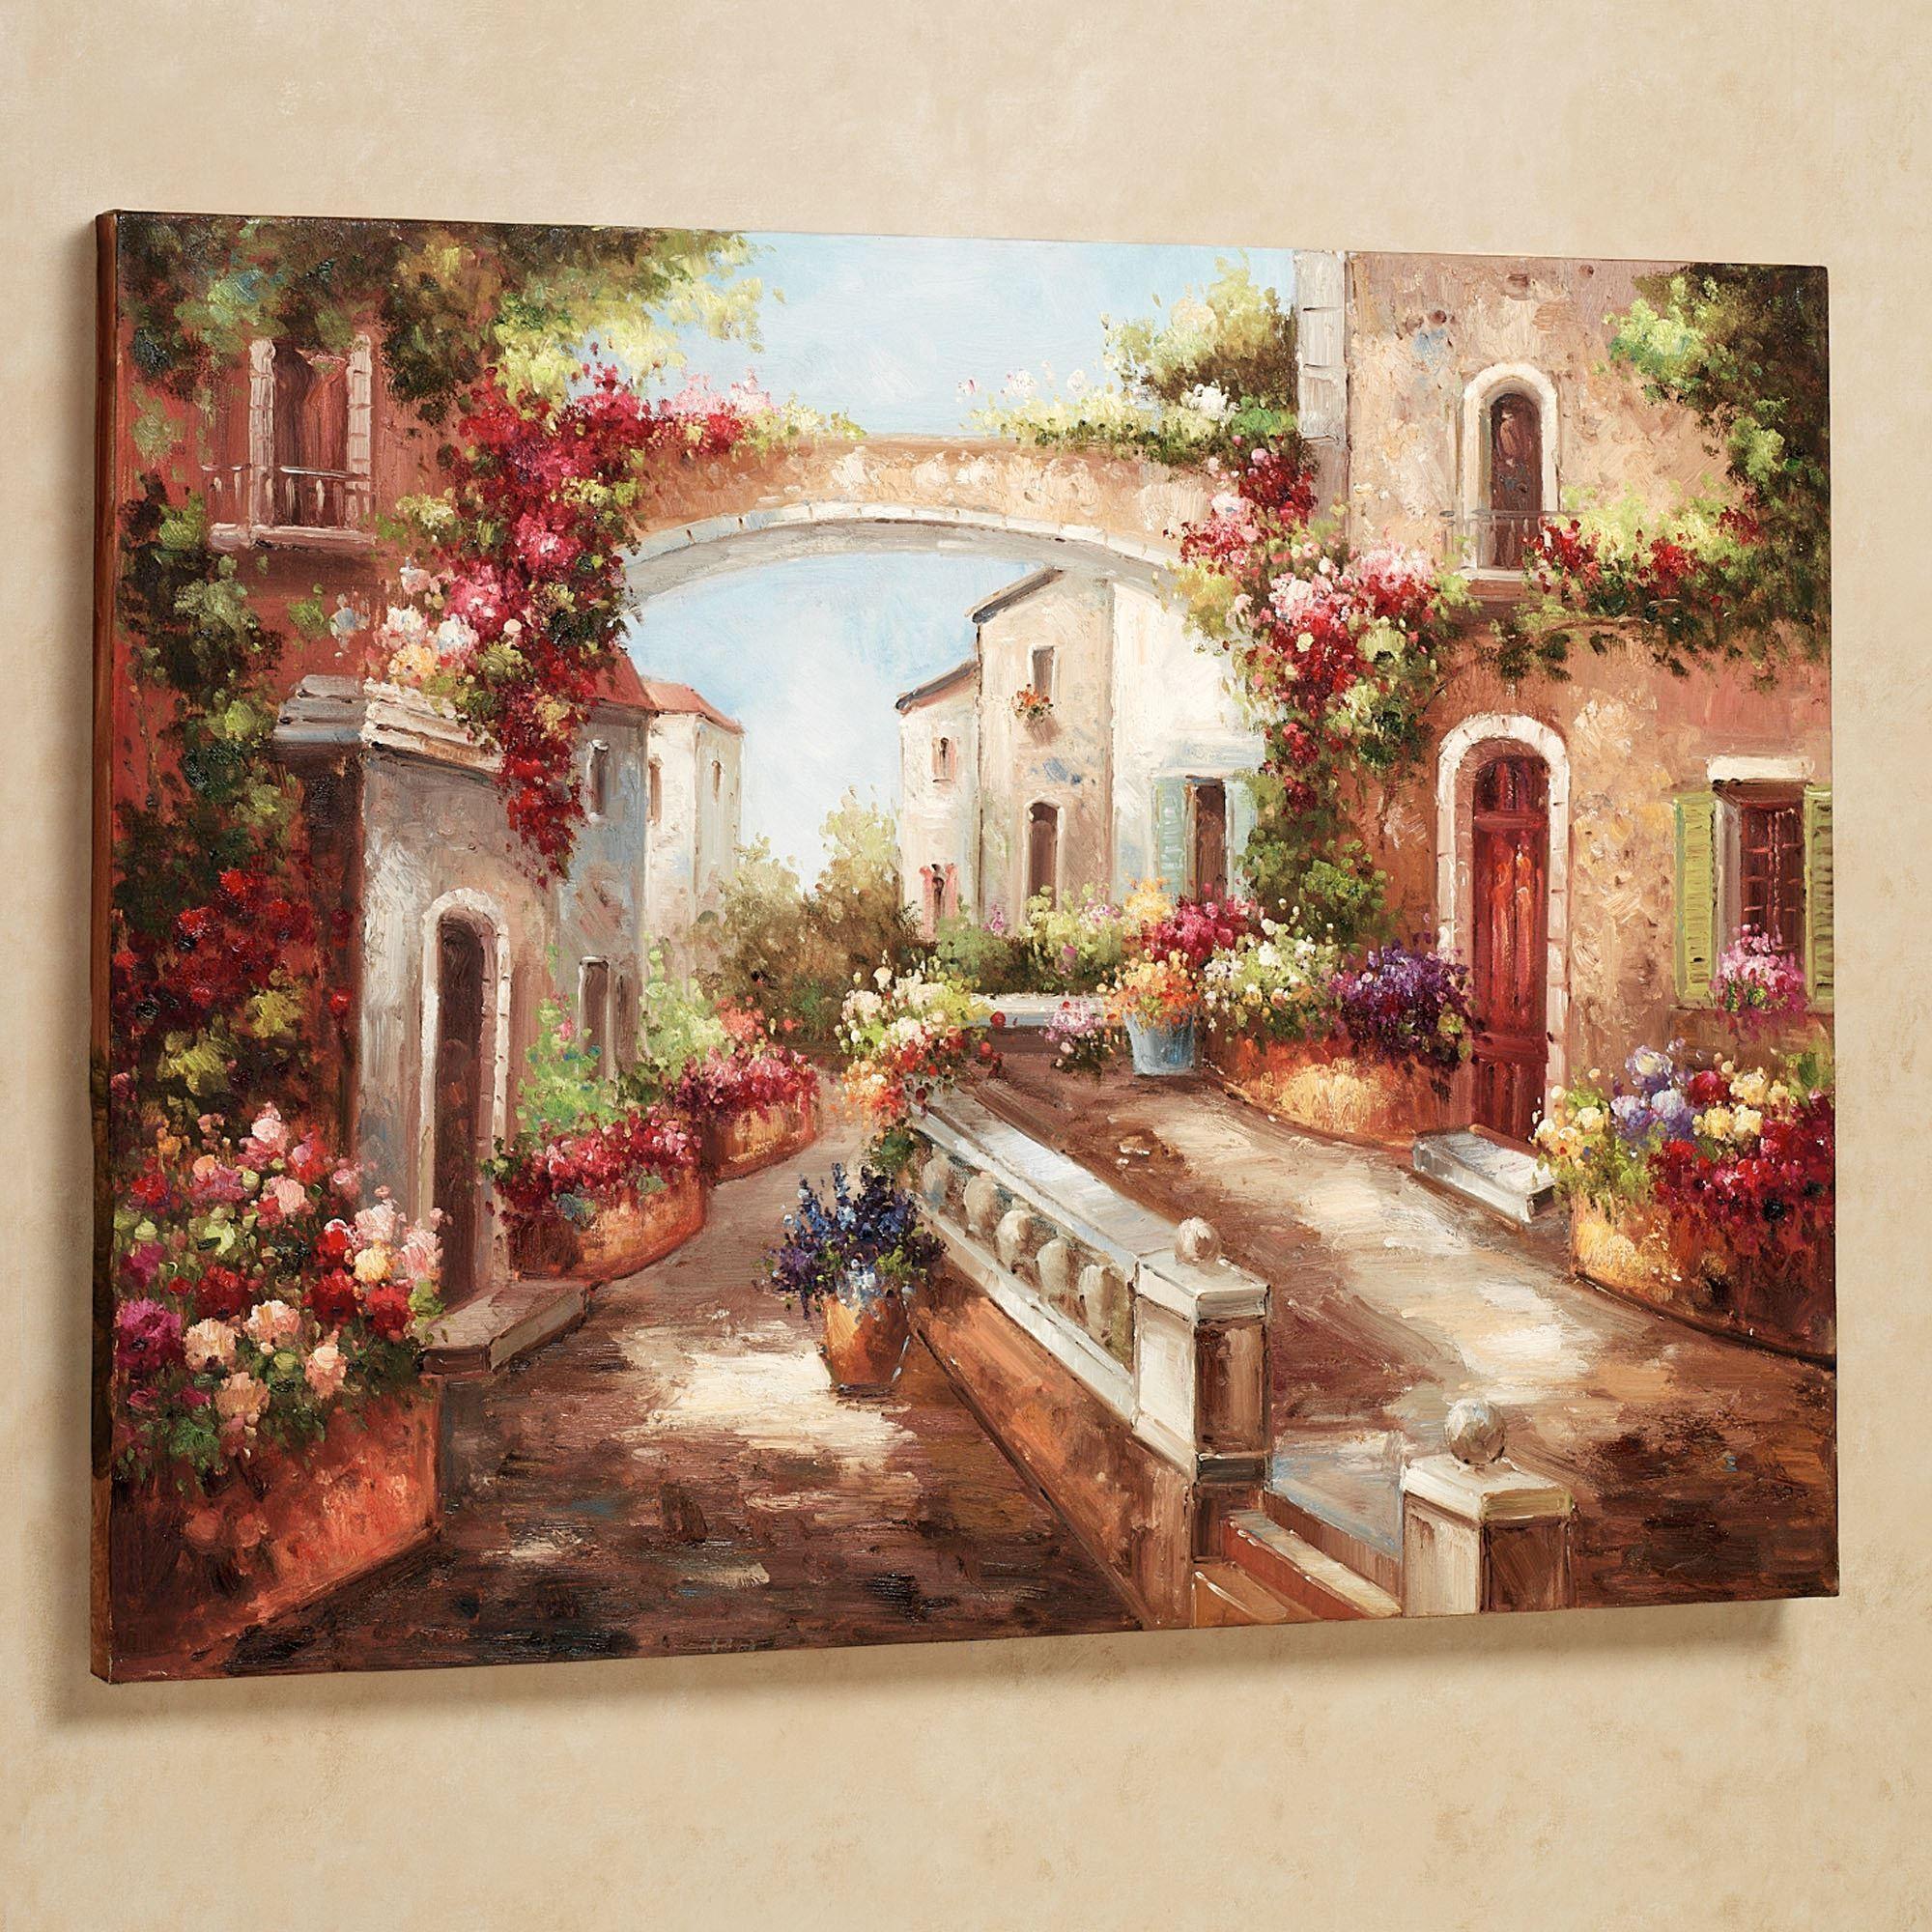 Italian Wall Art Designing Home Inspiration Lovely – Lovely Home Throughout Italian Villa Wall Art (Image 8 of 20)